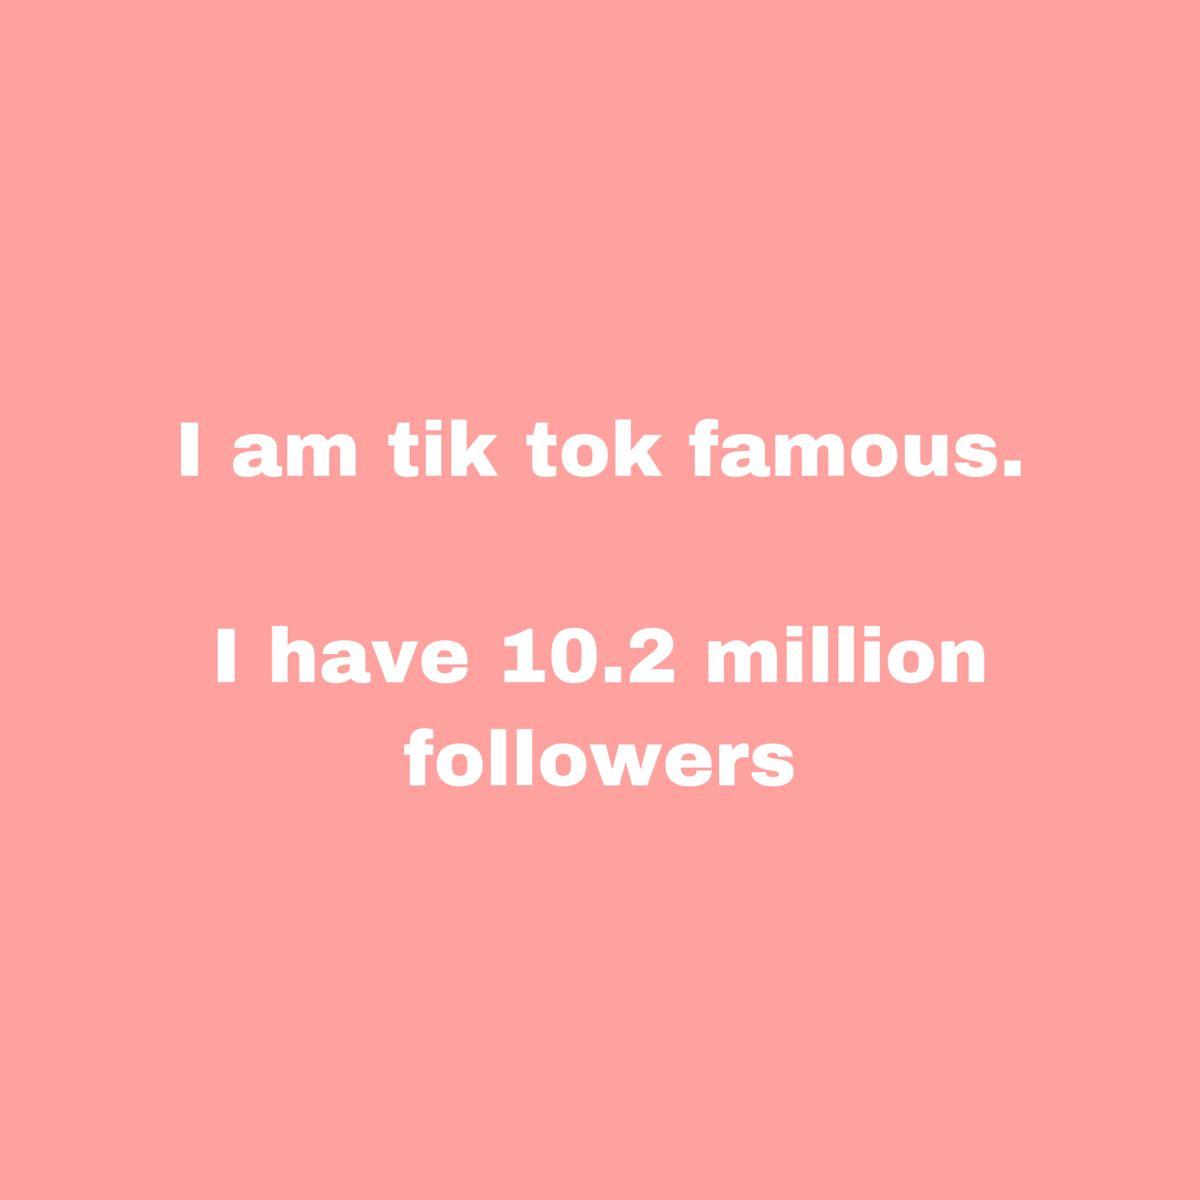 Tik Tok Famous Affirmation Positive Self Affirmations Affirmations Famous